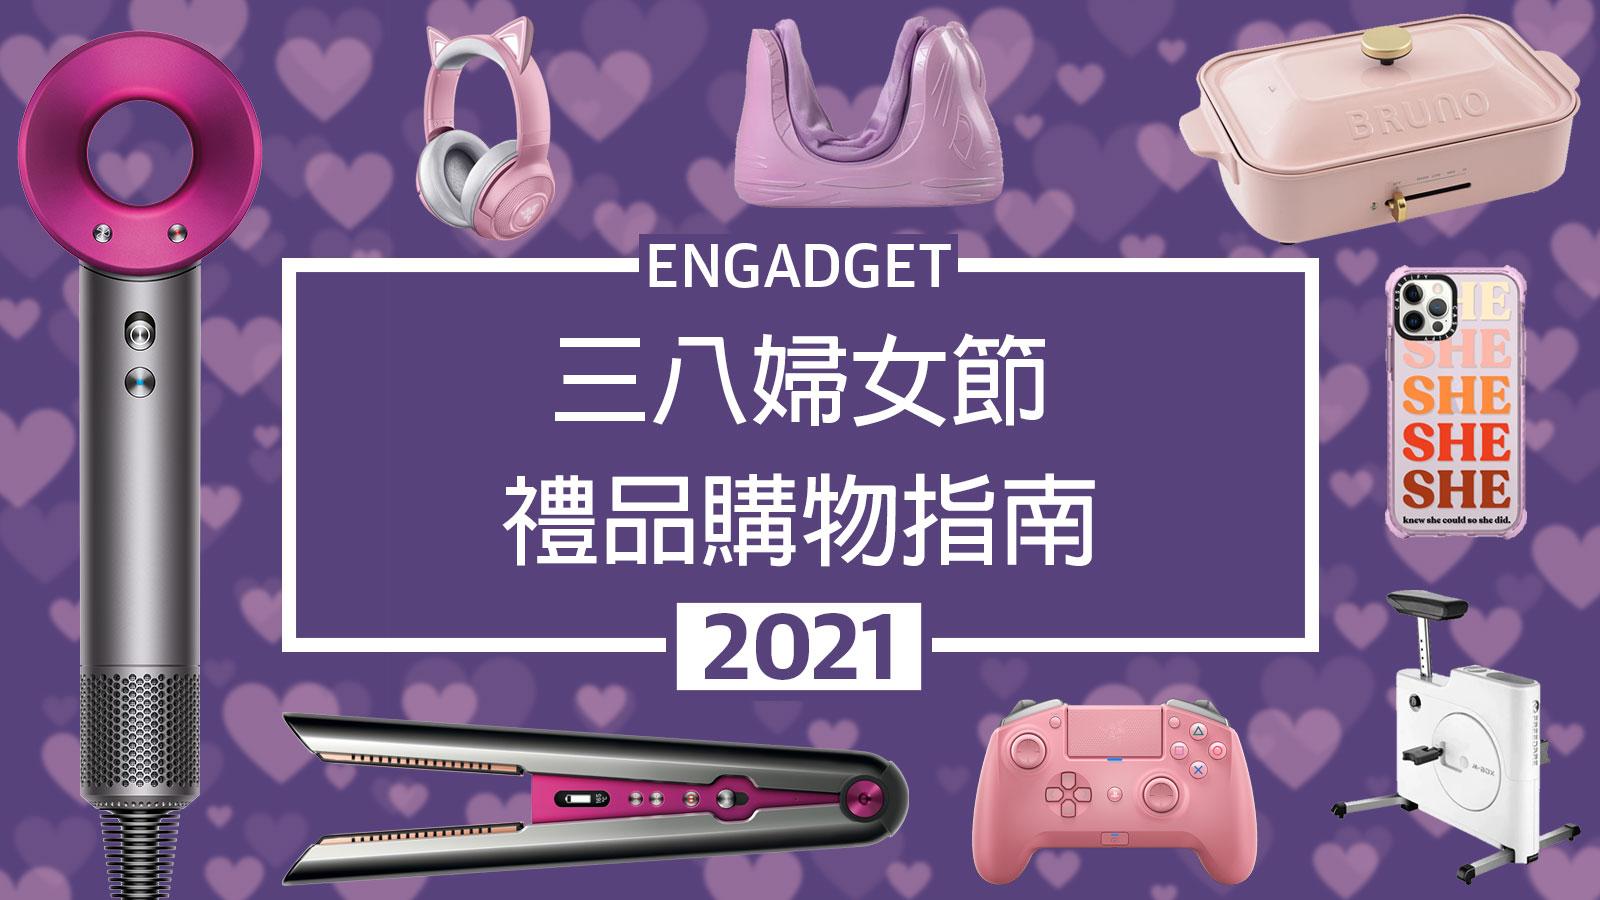 Engadget 三八婦女節購物指南